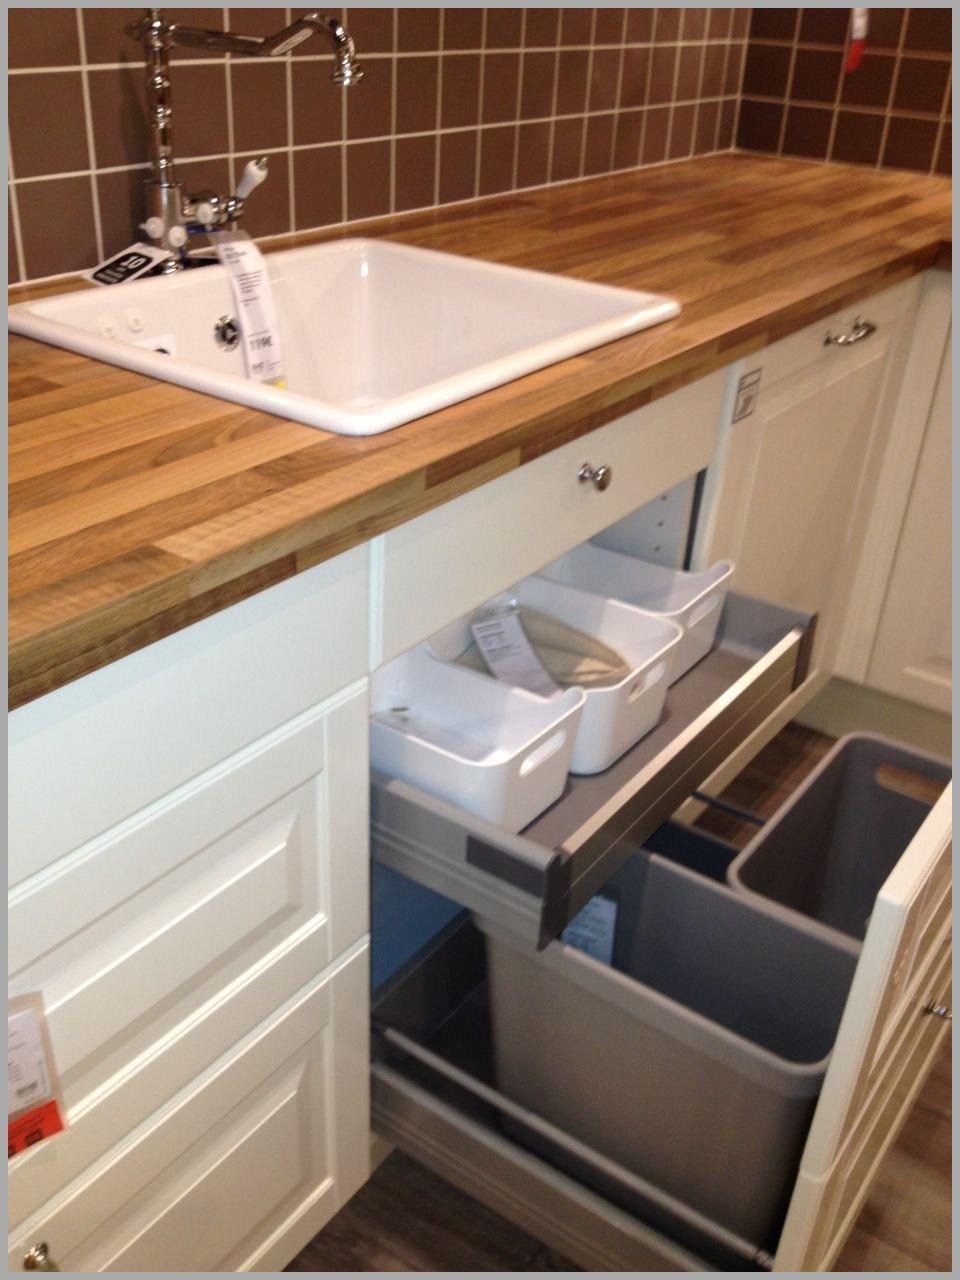 Ikea tiroir sous evier id es de travaux Tiroirs cuisine ikea